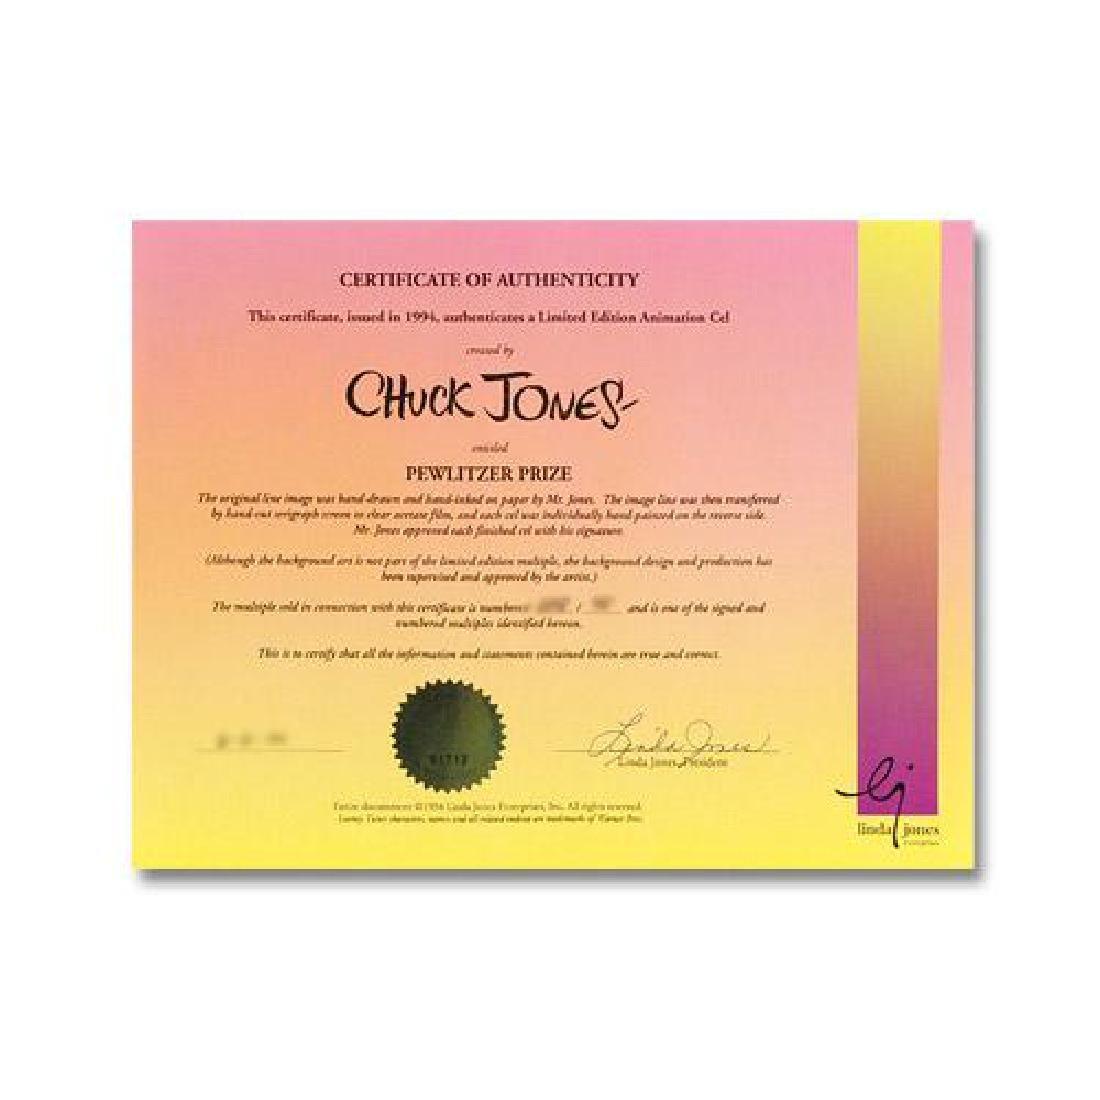 Pewlitzer Prize by Chuck Jones (1912-2002) - 3